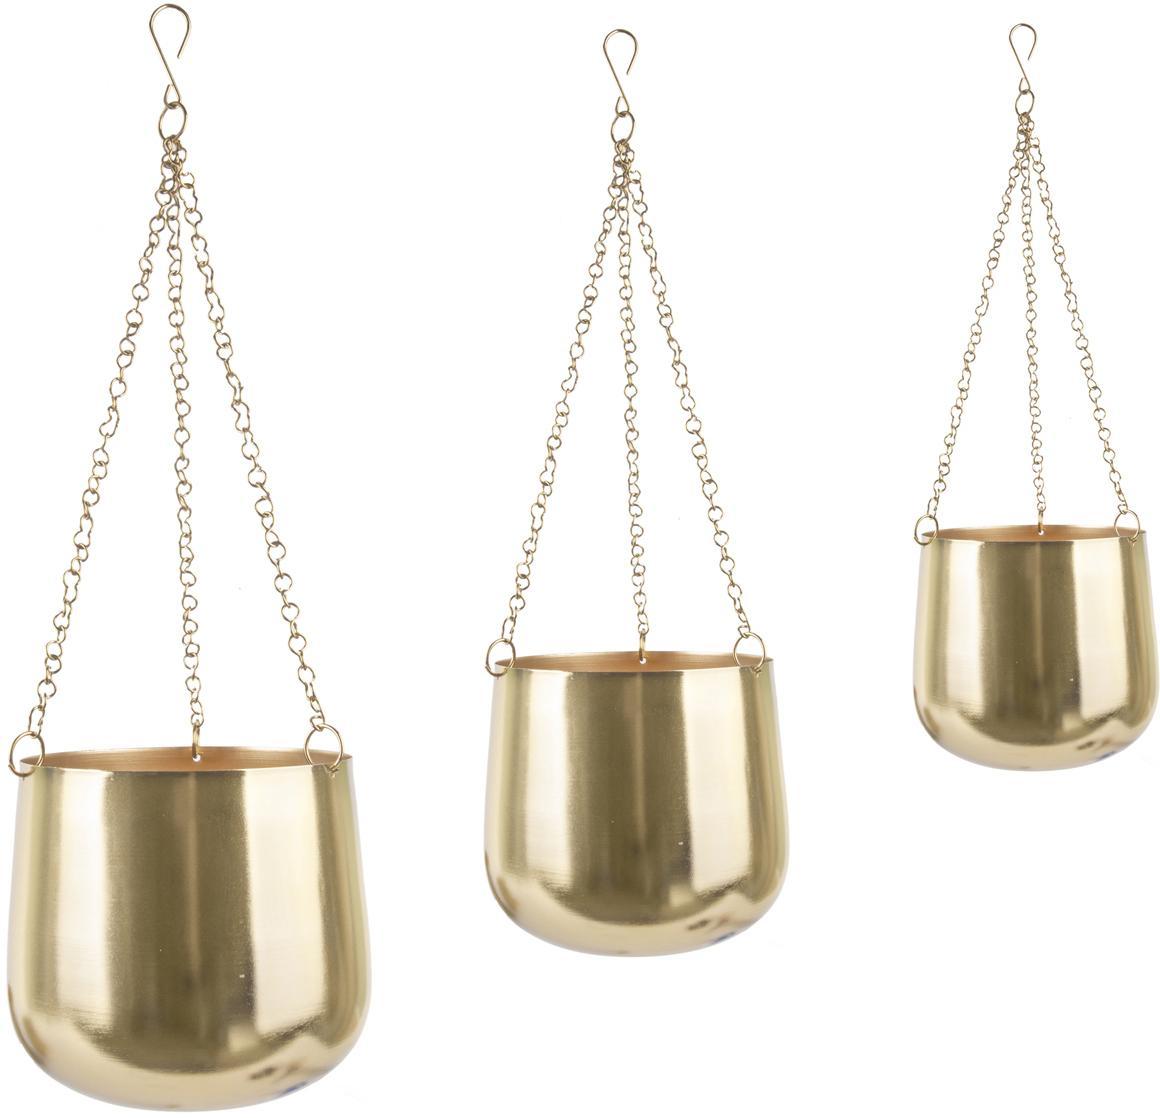 Set de maceteros colgantes de metal Cask, 3pzas., Metal pintado, Dorado, Set de diferentes tamaños